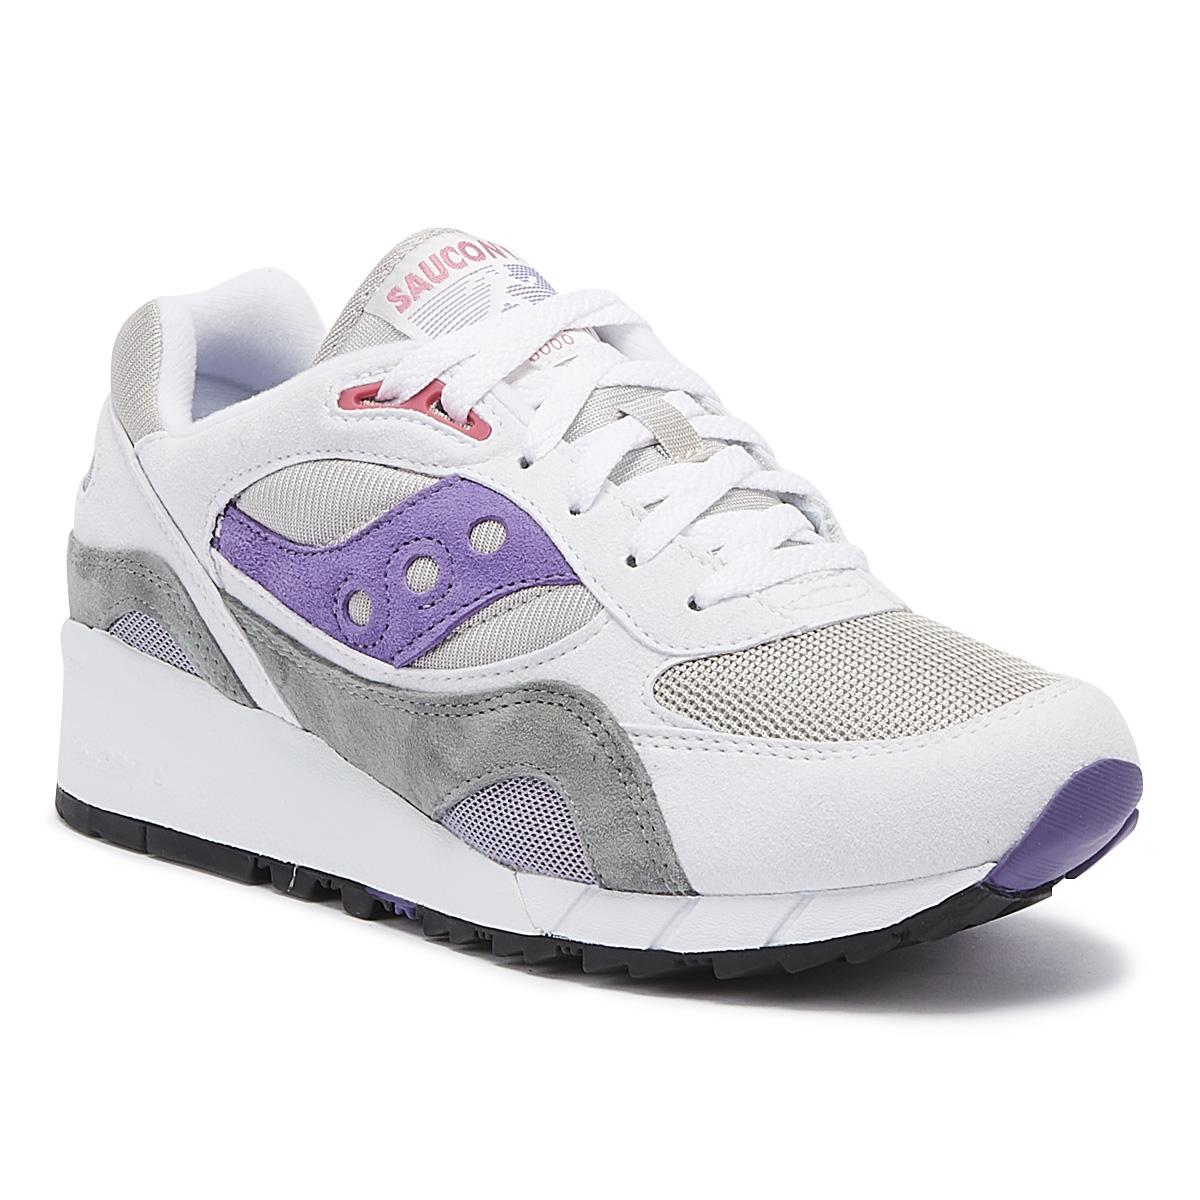 the best attitude f3a26 b97f2 Men's Shadow 6000 White / Gray / Purple Sneakers